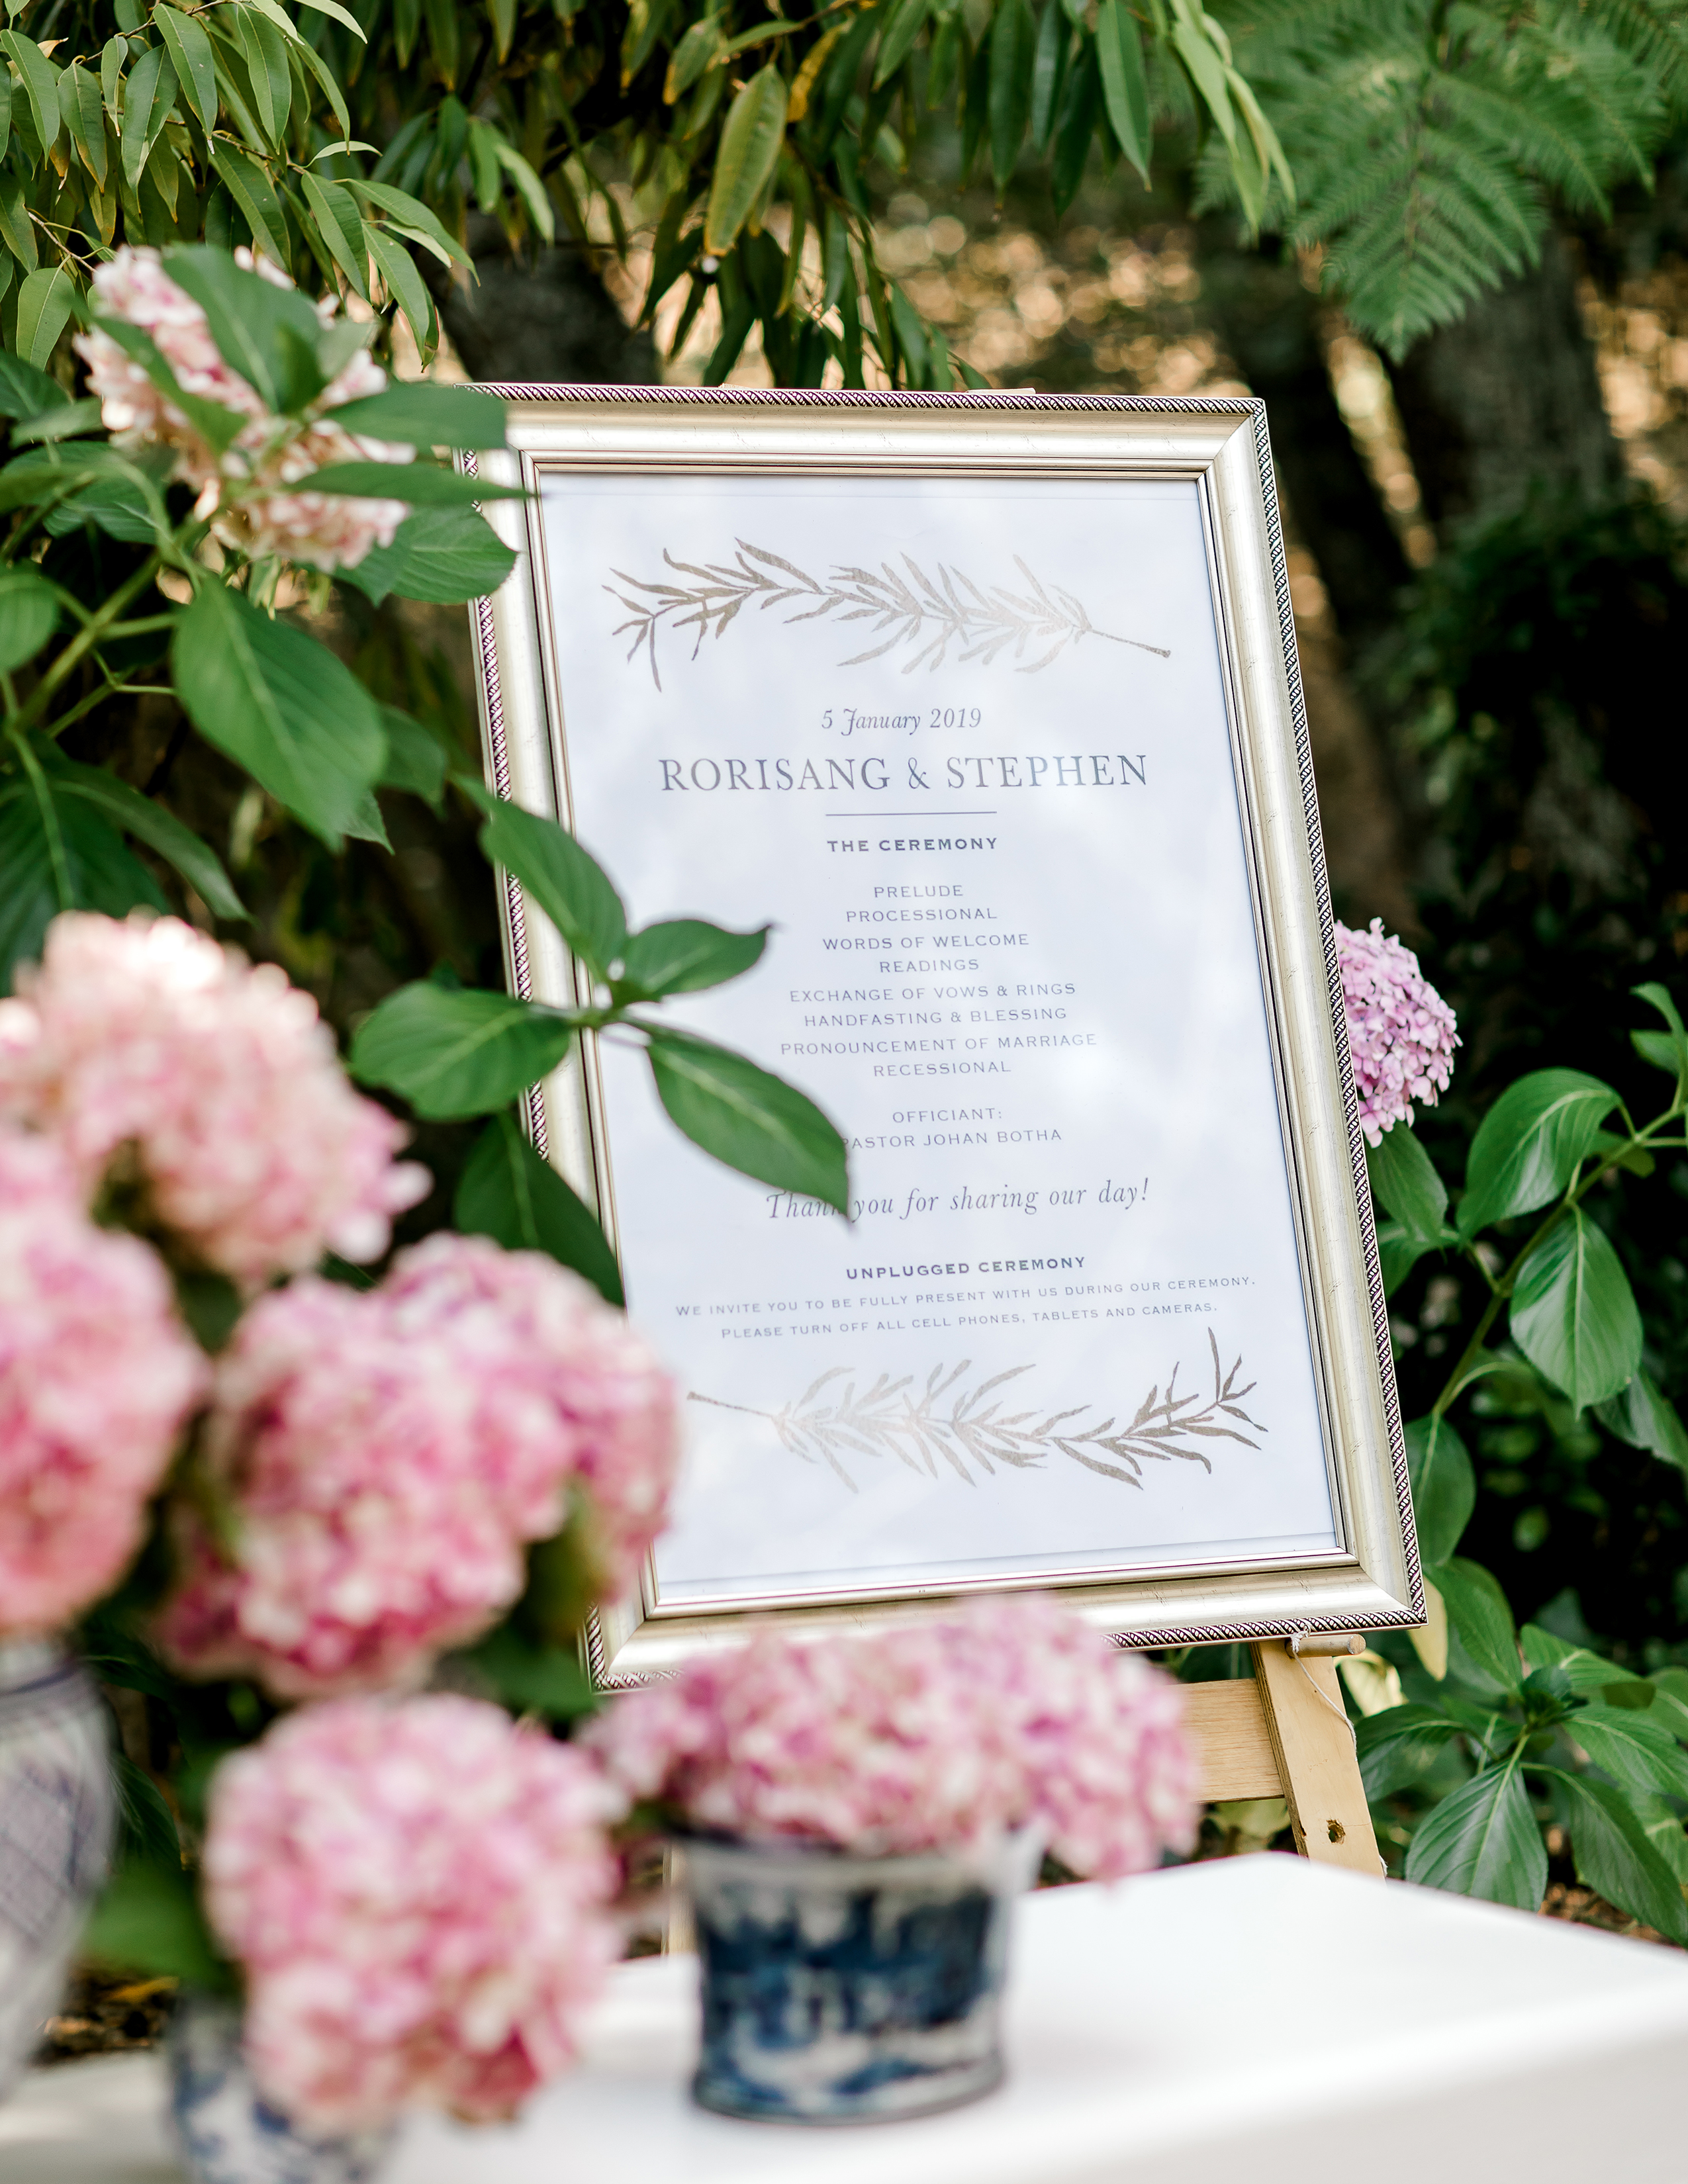 rorisang stephen wedding sign